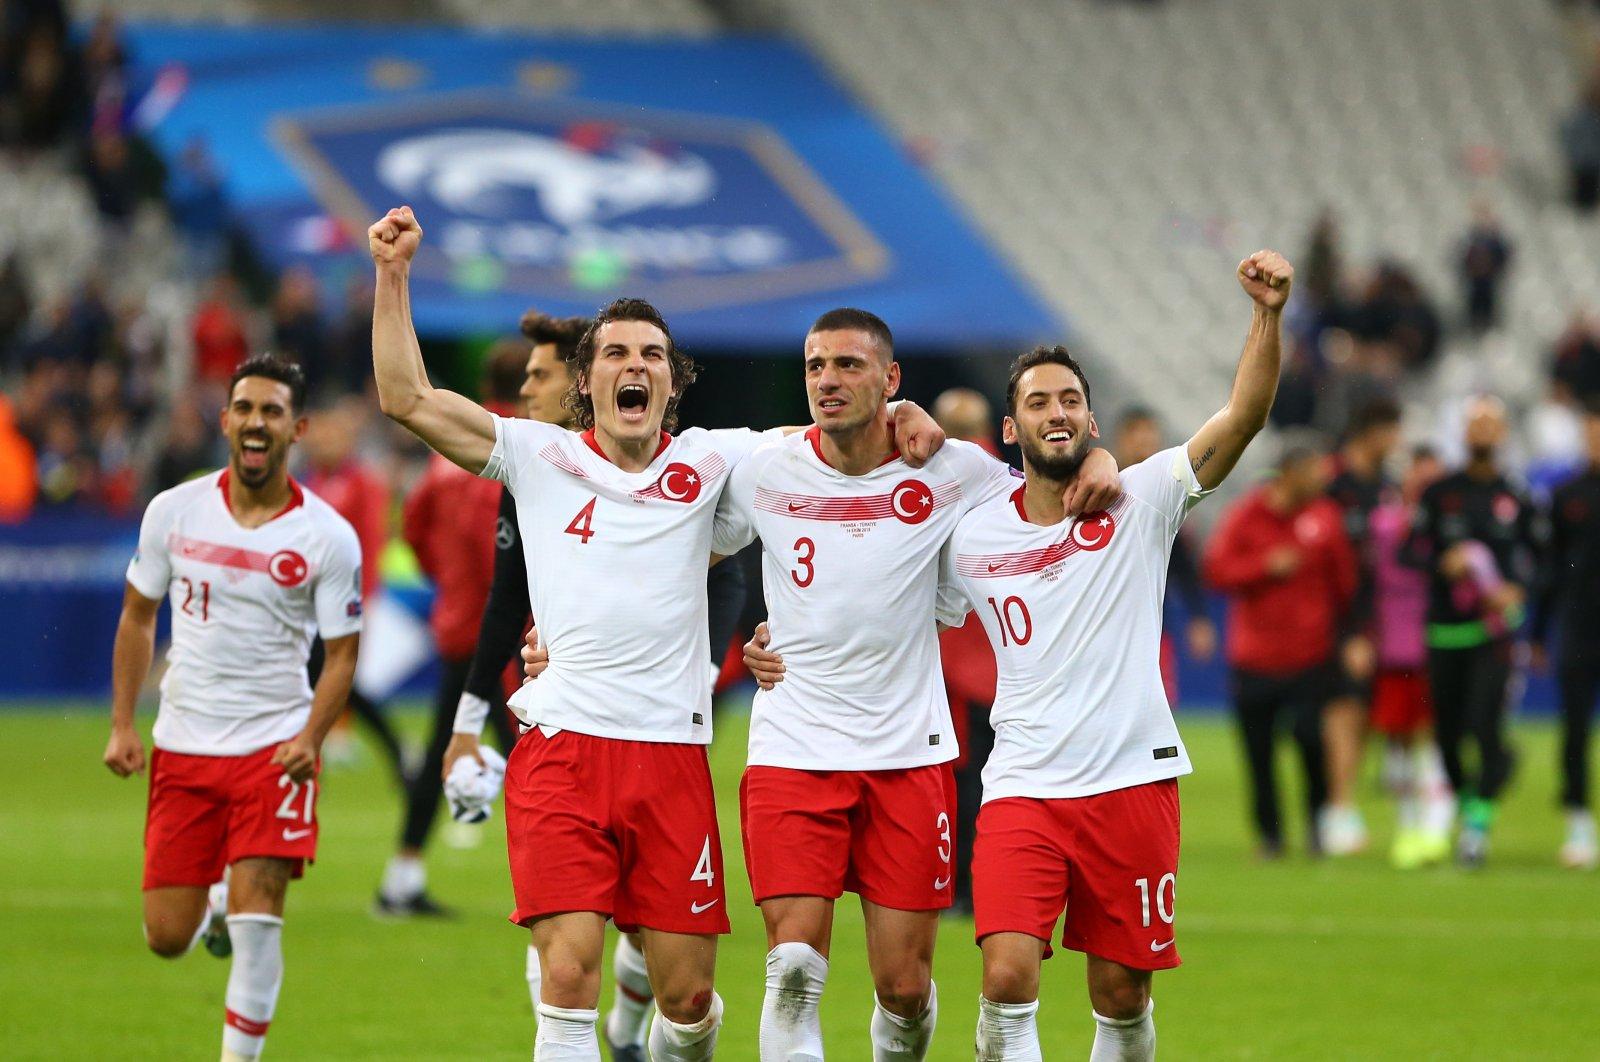 Turkey's Çağlar Söyüncü (L), Merih Demiral (C) and Hakan Çalhanoğlu celebrate after a match against France, at the Stade de France, Paris, France, Sept. 14, 2019. (Sabah Photo)